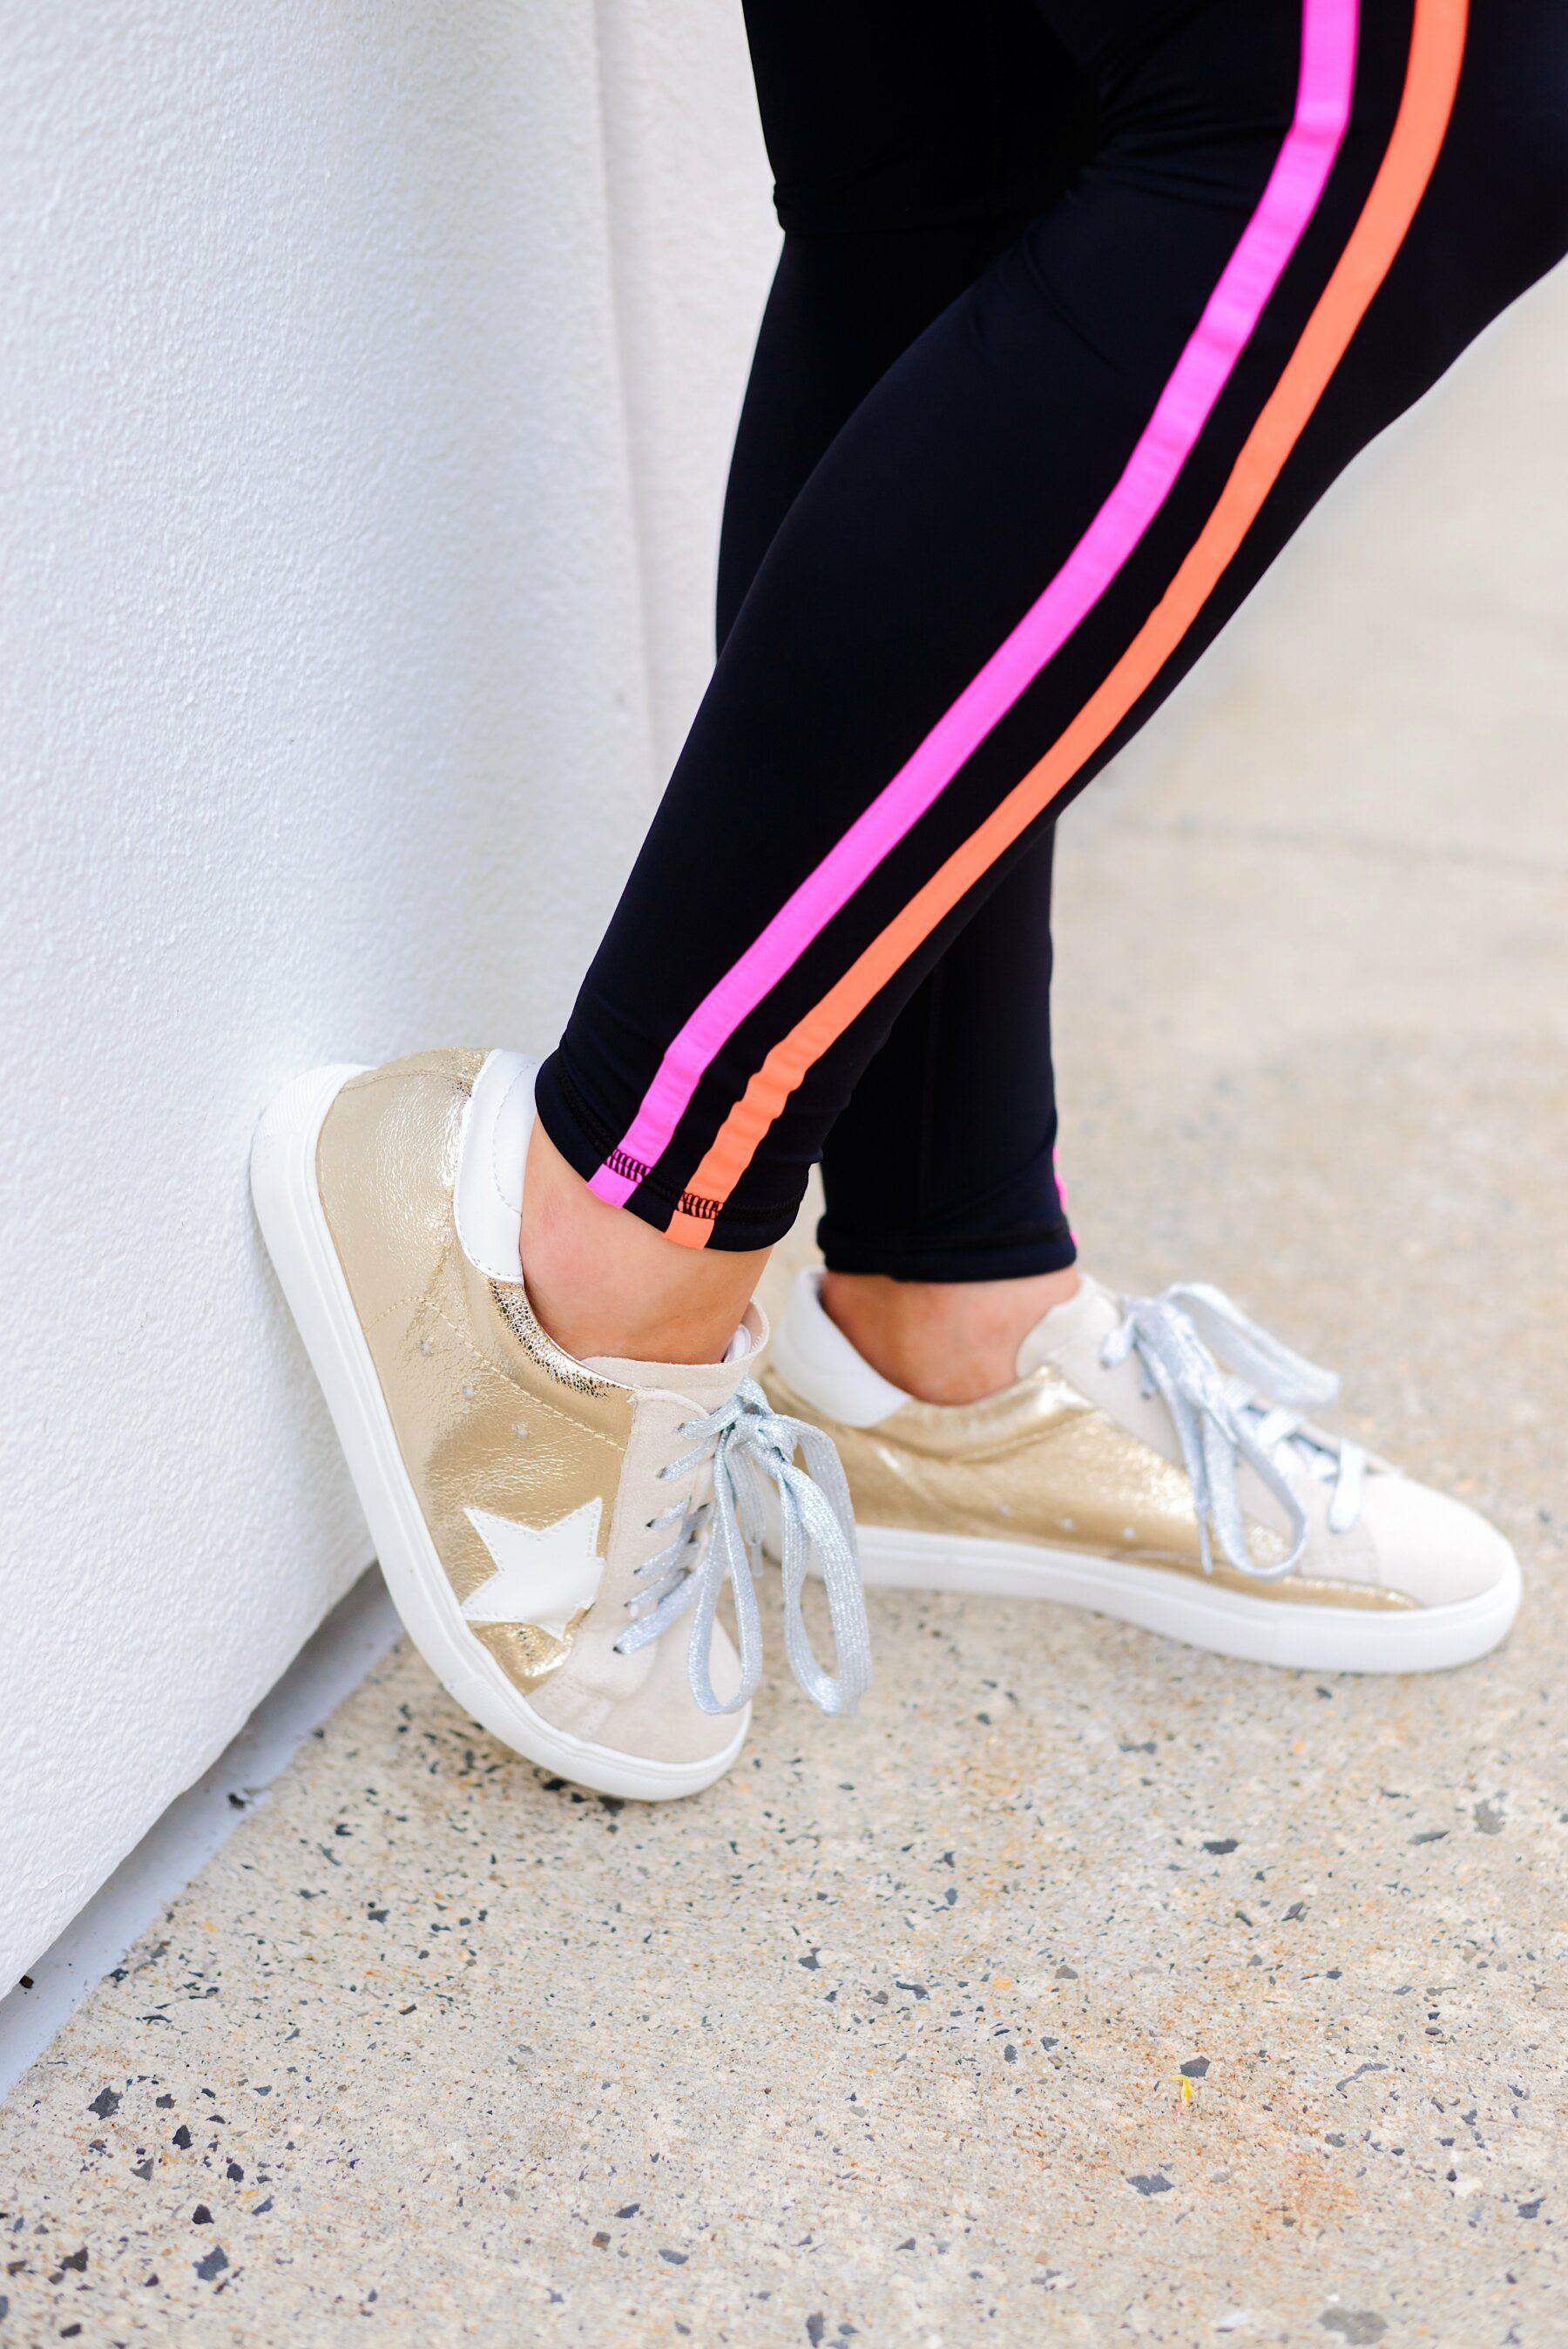 Golden goose knockoff sneakers